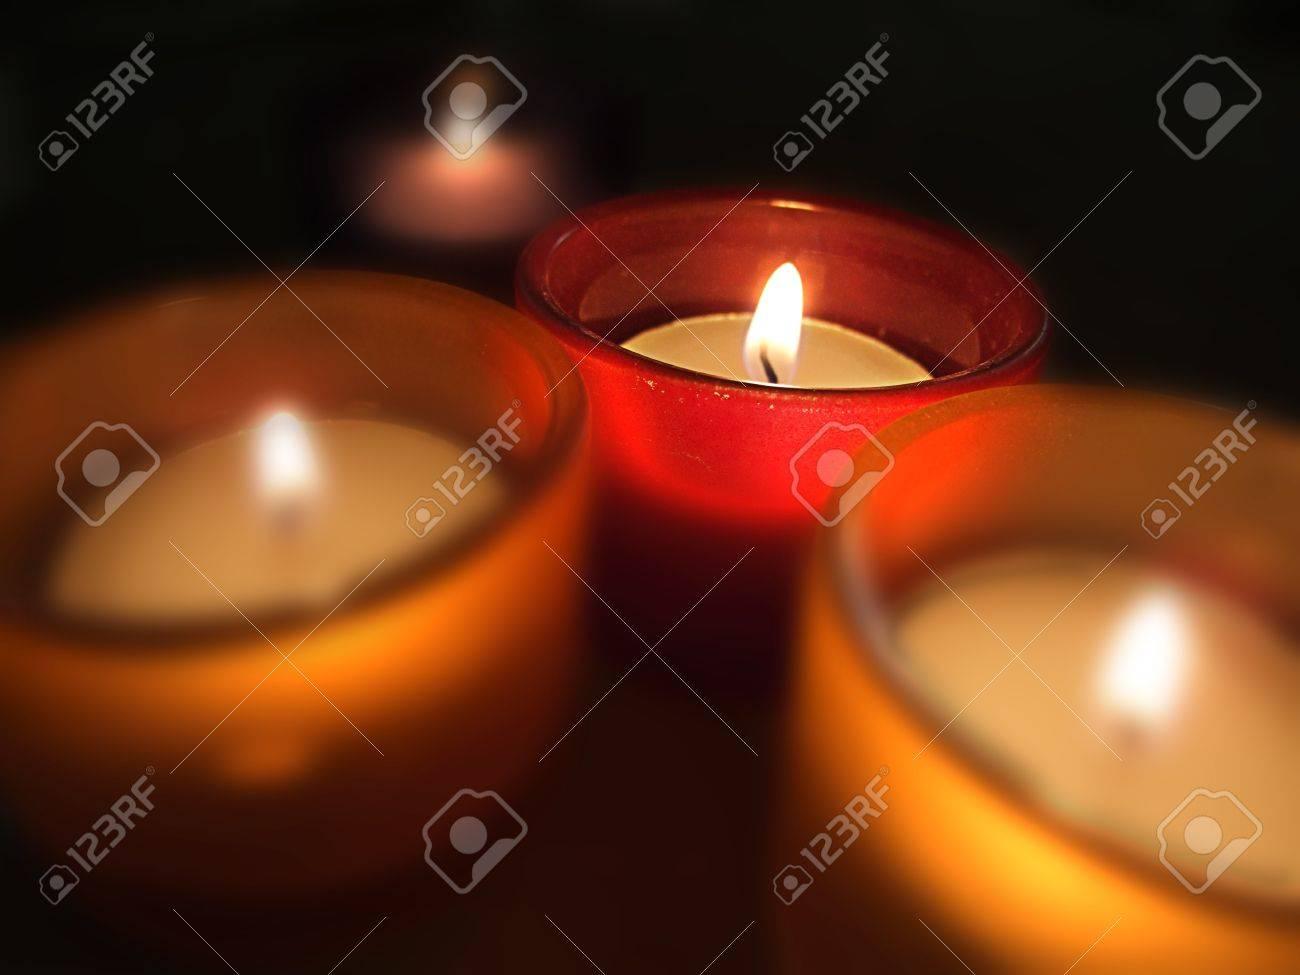 Cuatro porta-velas de cristal con velas encendidas. Four carry-you guard of crystal with ignited candles. Stock Photo - 13418569